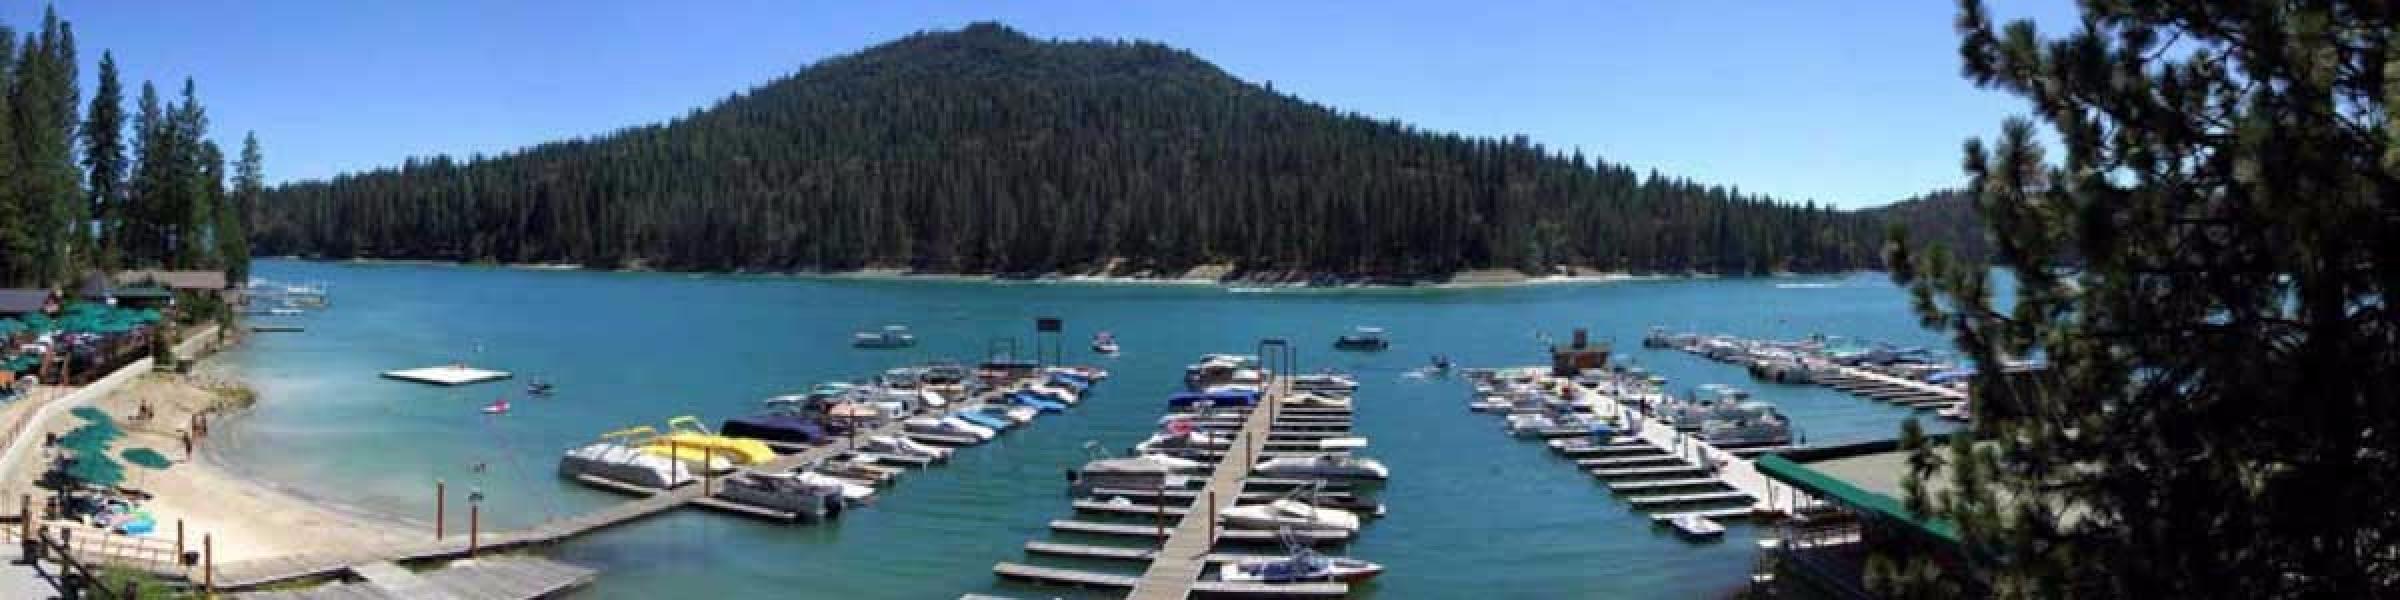 2015-fish-eye-bass-lake-marina-slider